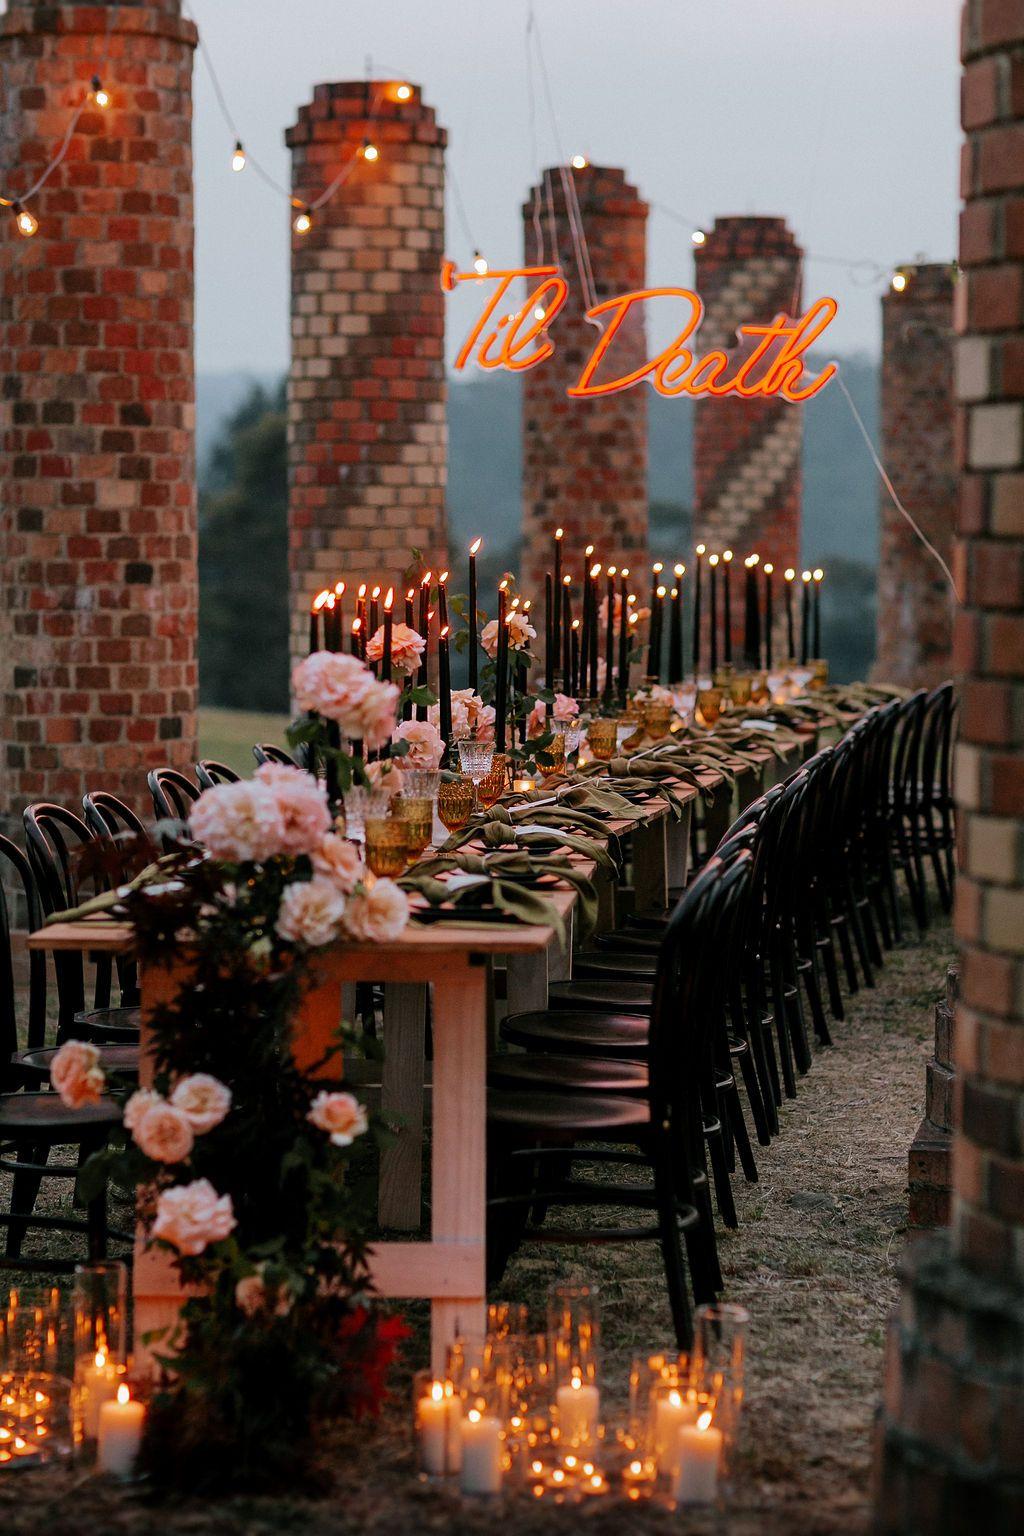 STYLED PARADISE BOTANICAL in 2020 Wedding, Outdoor